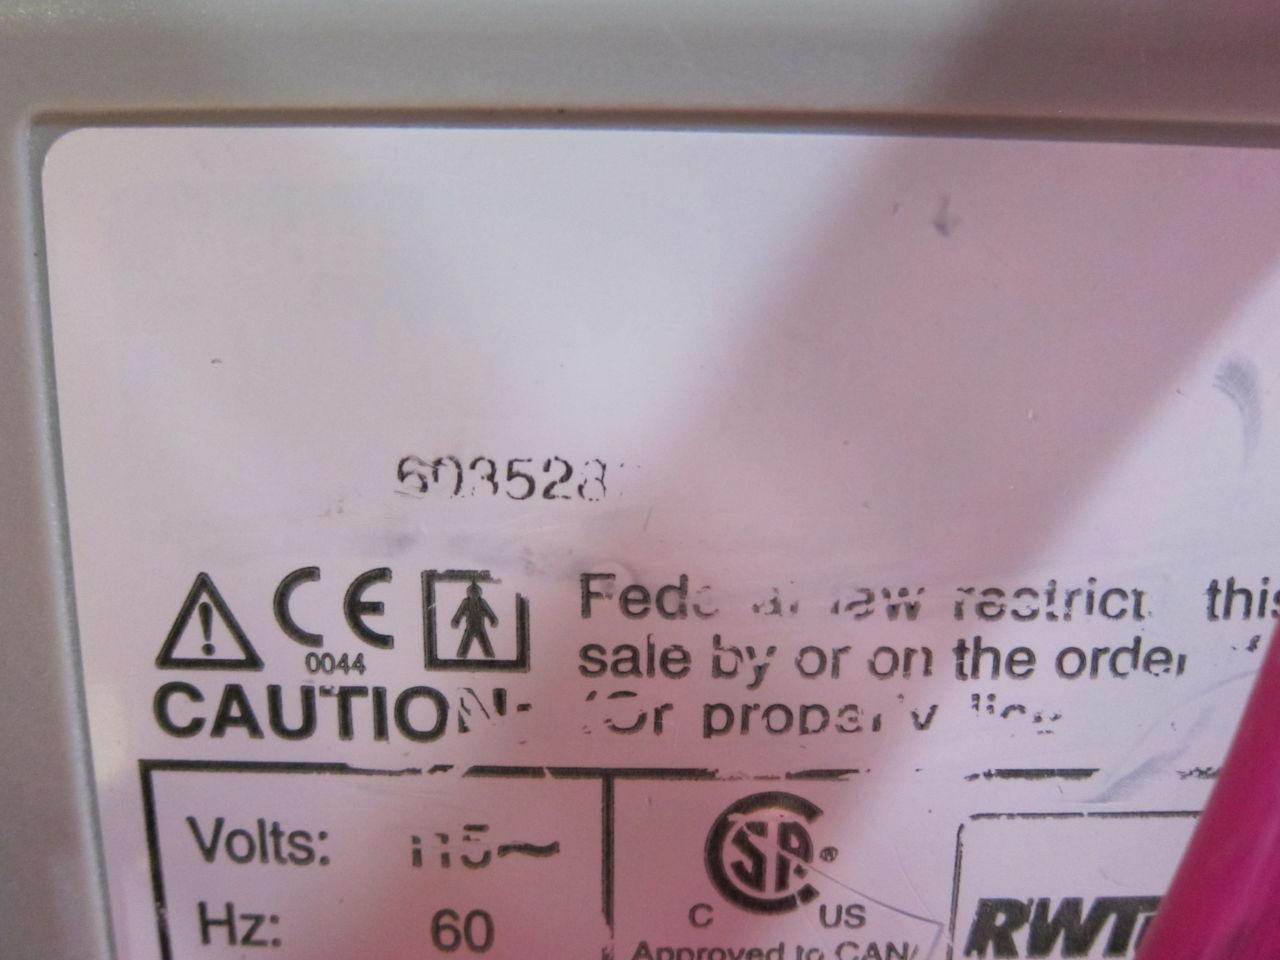 MICROTEK MEDICAL VIA VENODYNE Advantage 610  - Lot of 3 Pump Vascular Compression